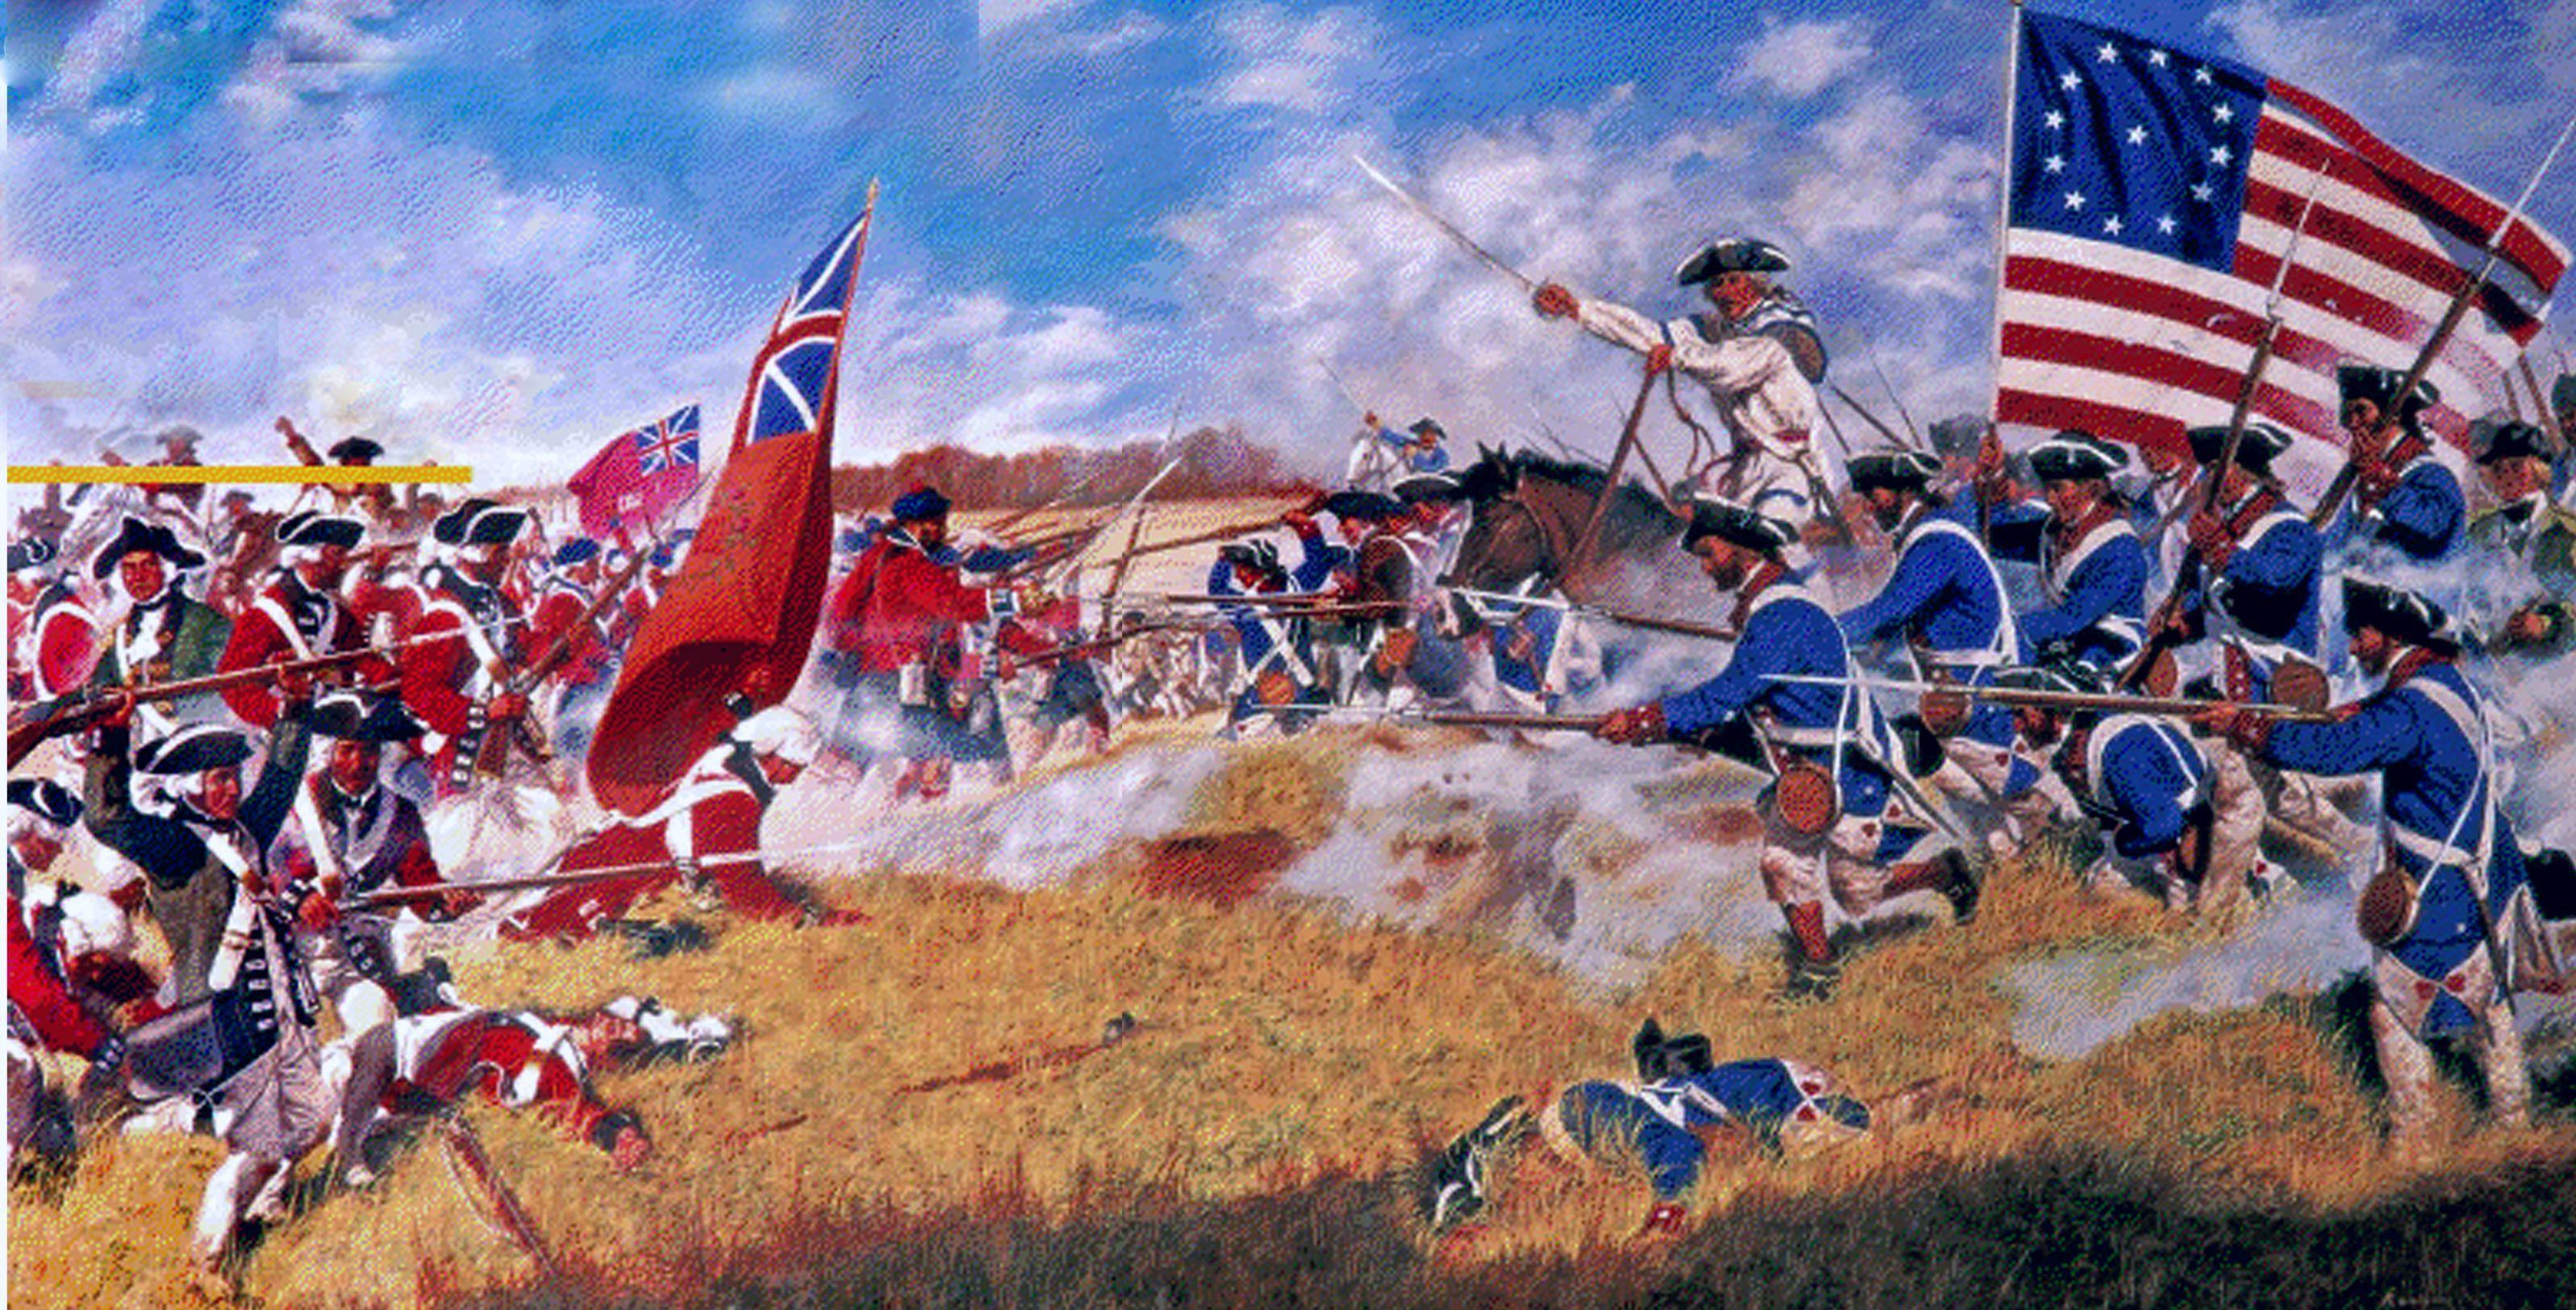 Battle Of Cowpens American Revolutionary War Battle Of Kings Mountain Revolutionary War